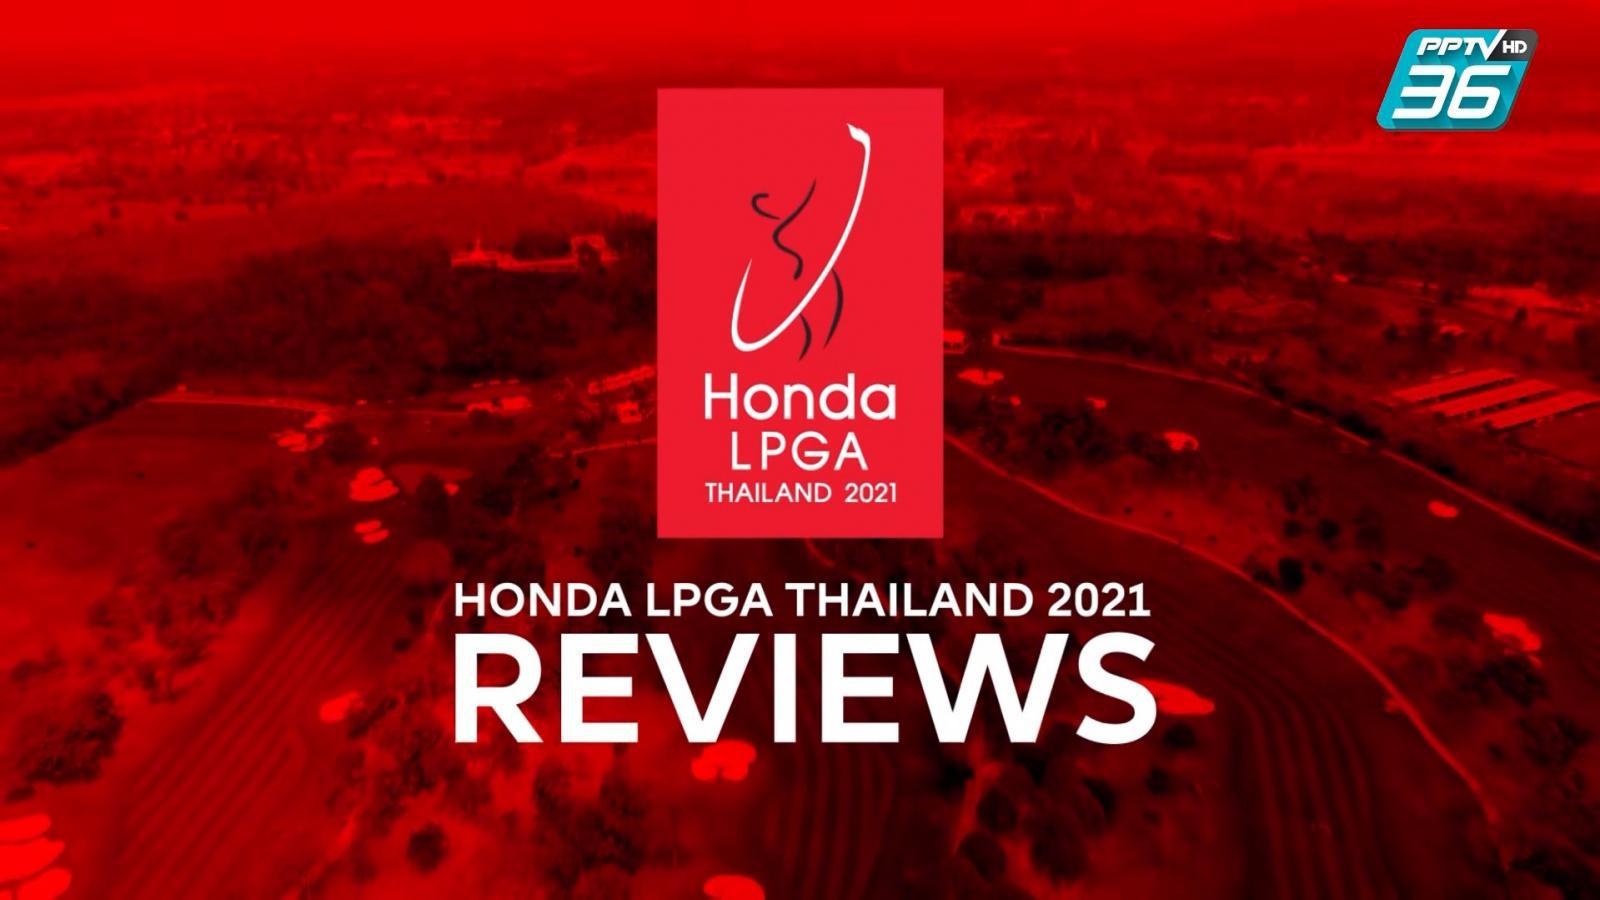 Honda LPGA Thailand 2021 Reviews : ตอนที่ 2